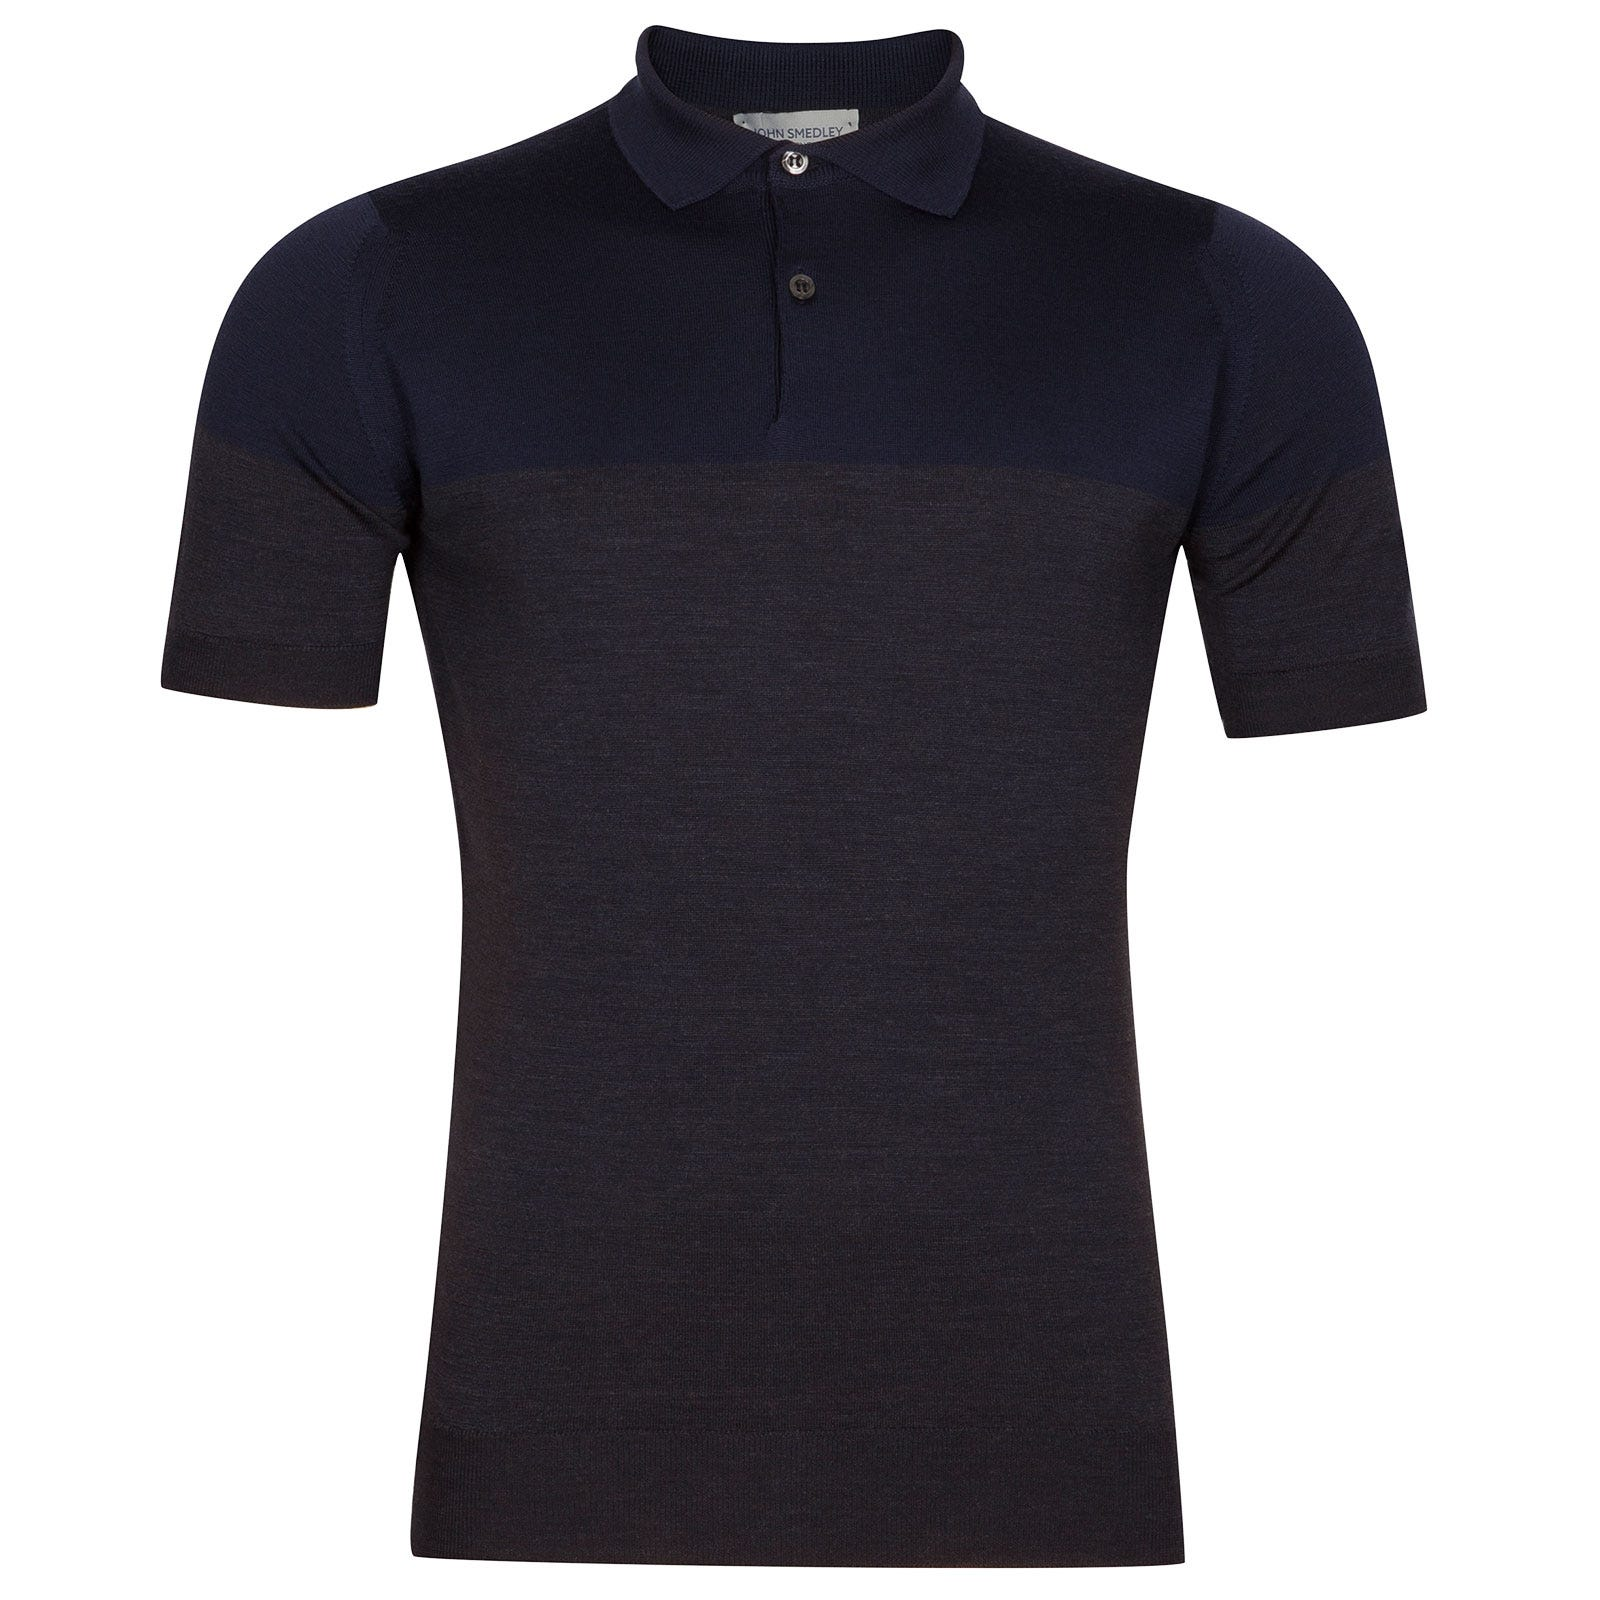 John Smedley Toller Extra Fine Merino Wool Shirt in Hepburn Smoke-L